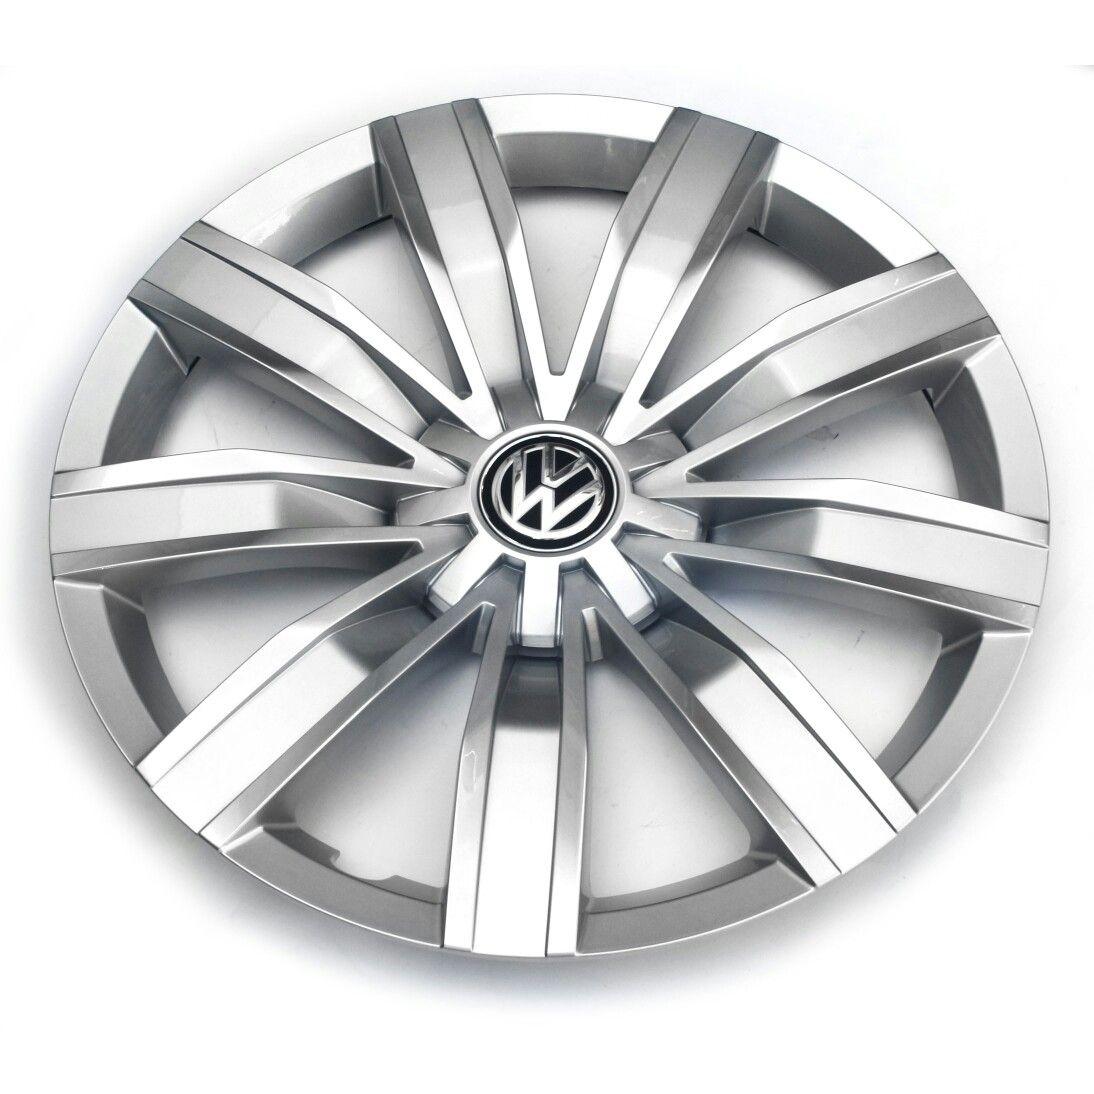 Tapacubos Volkswagen (Tiguan)